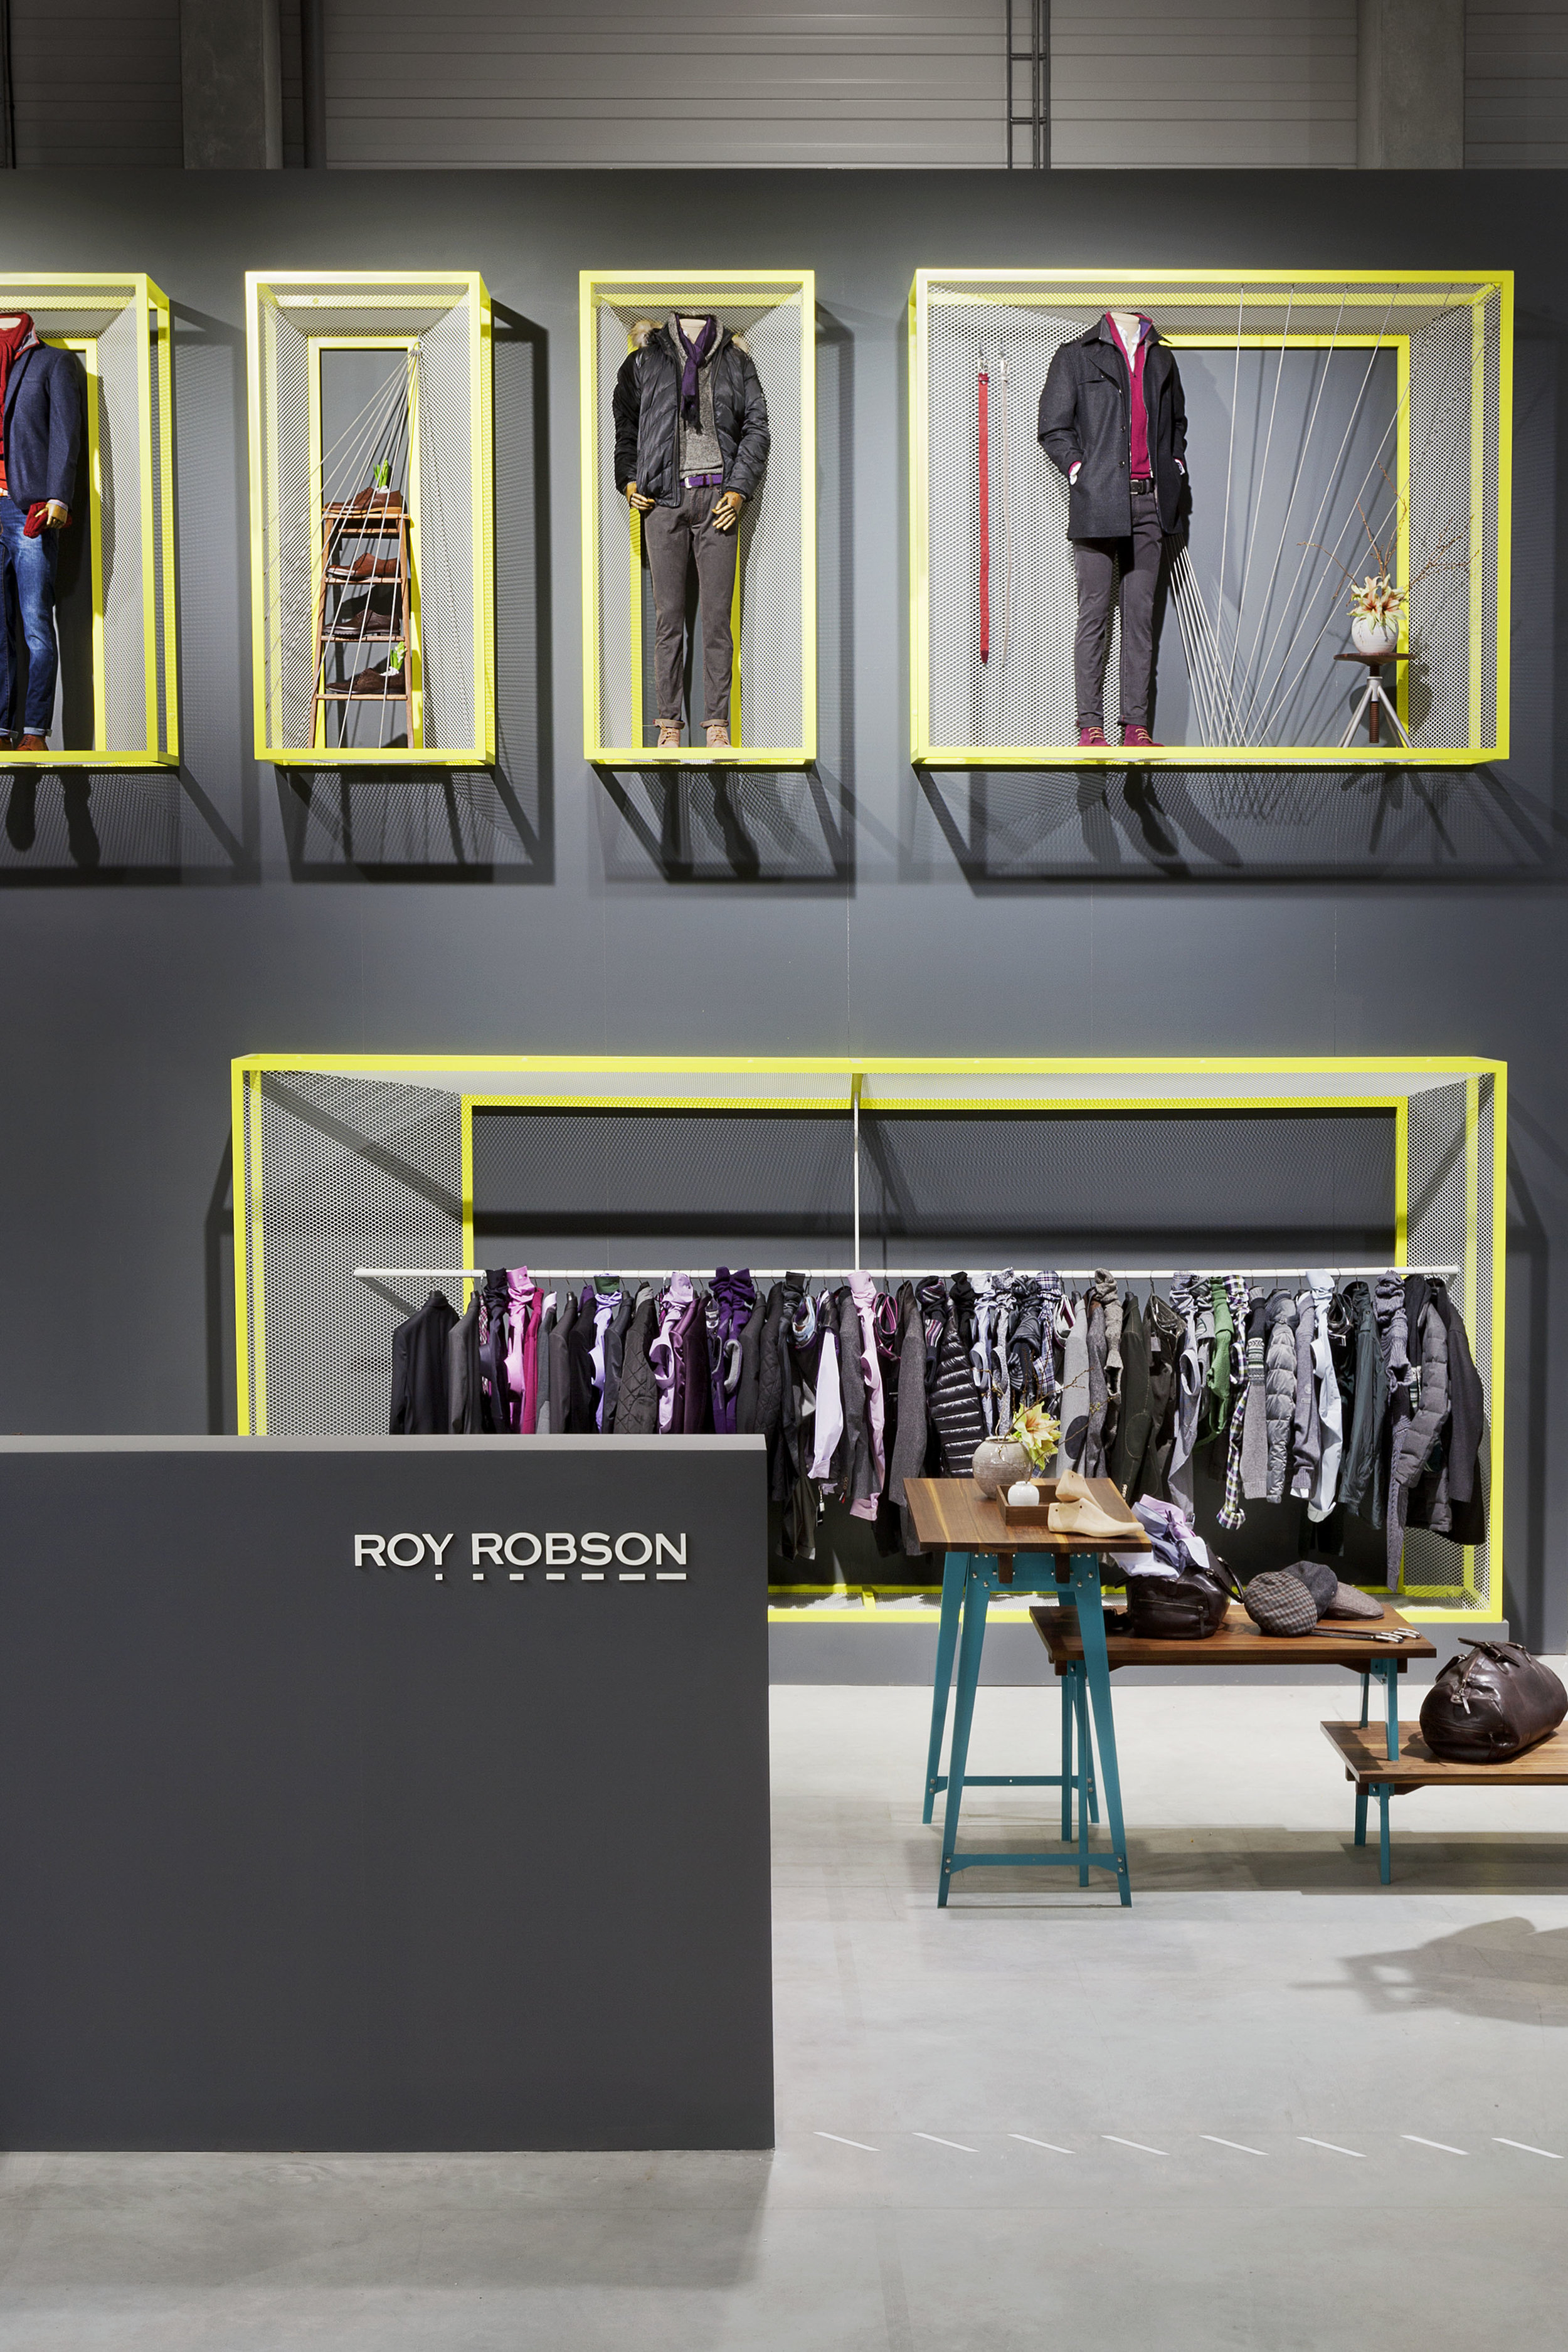 roy-robson_tradefair-exhibition-design_coordination-berlin_03.jpg